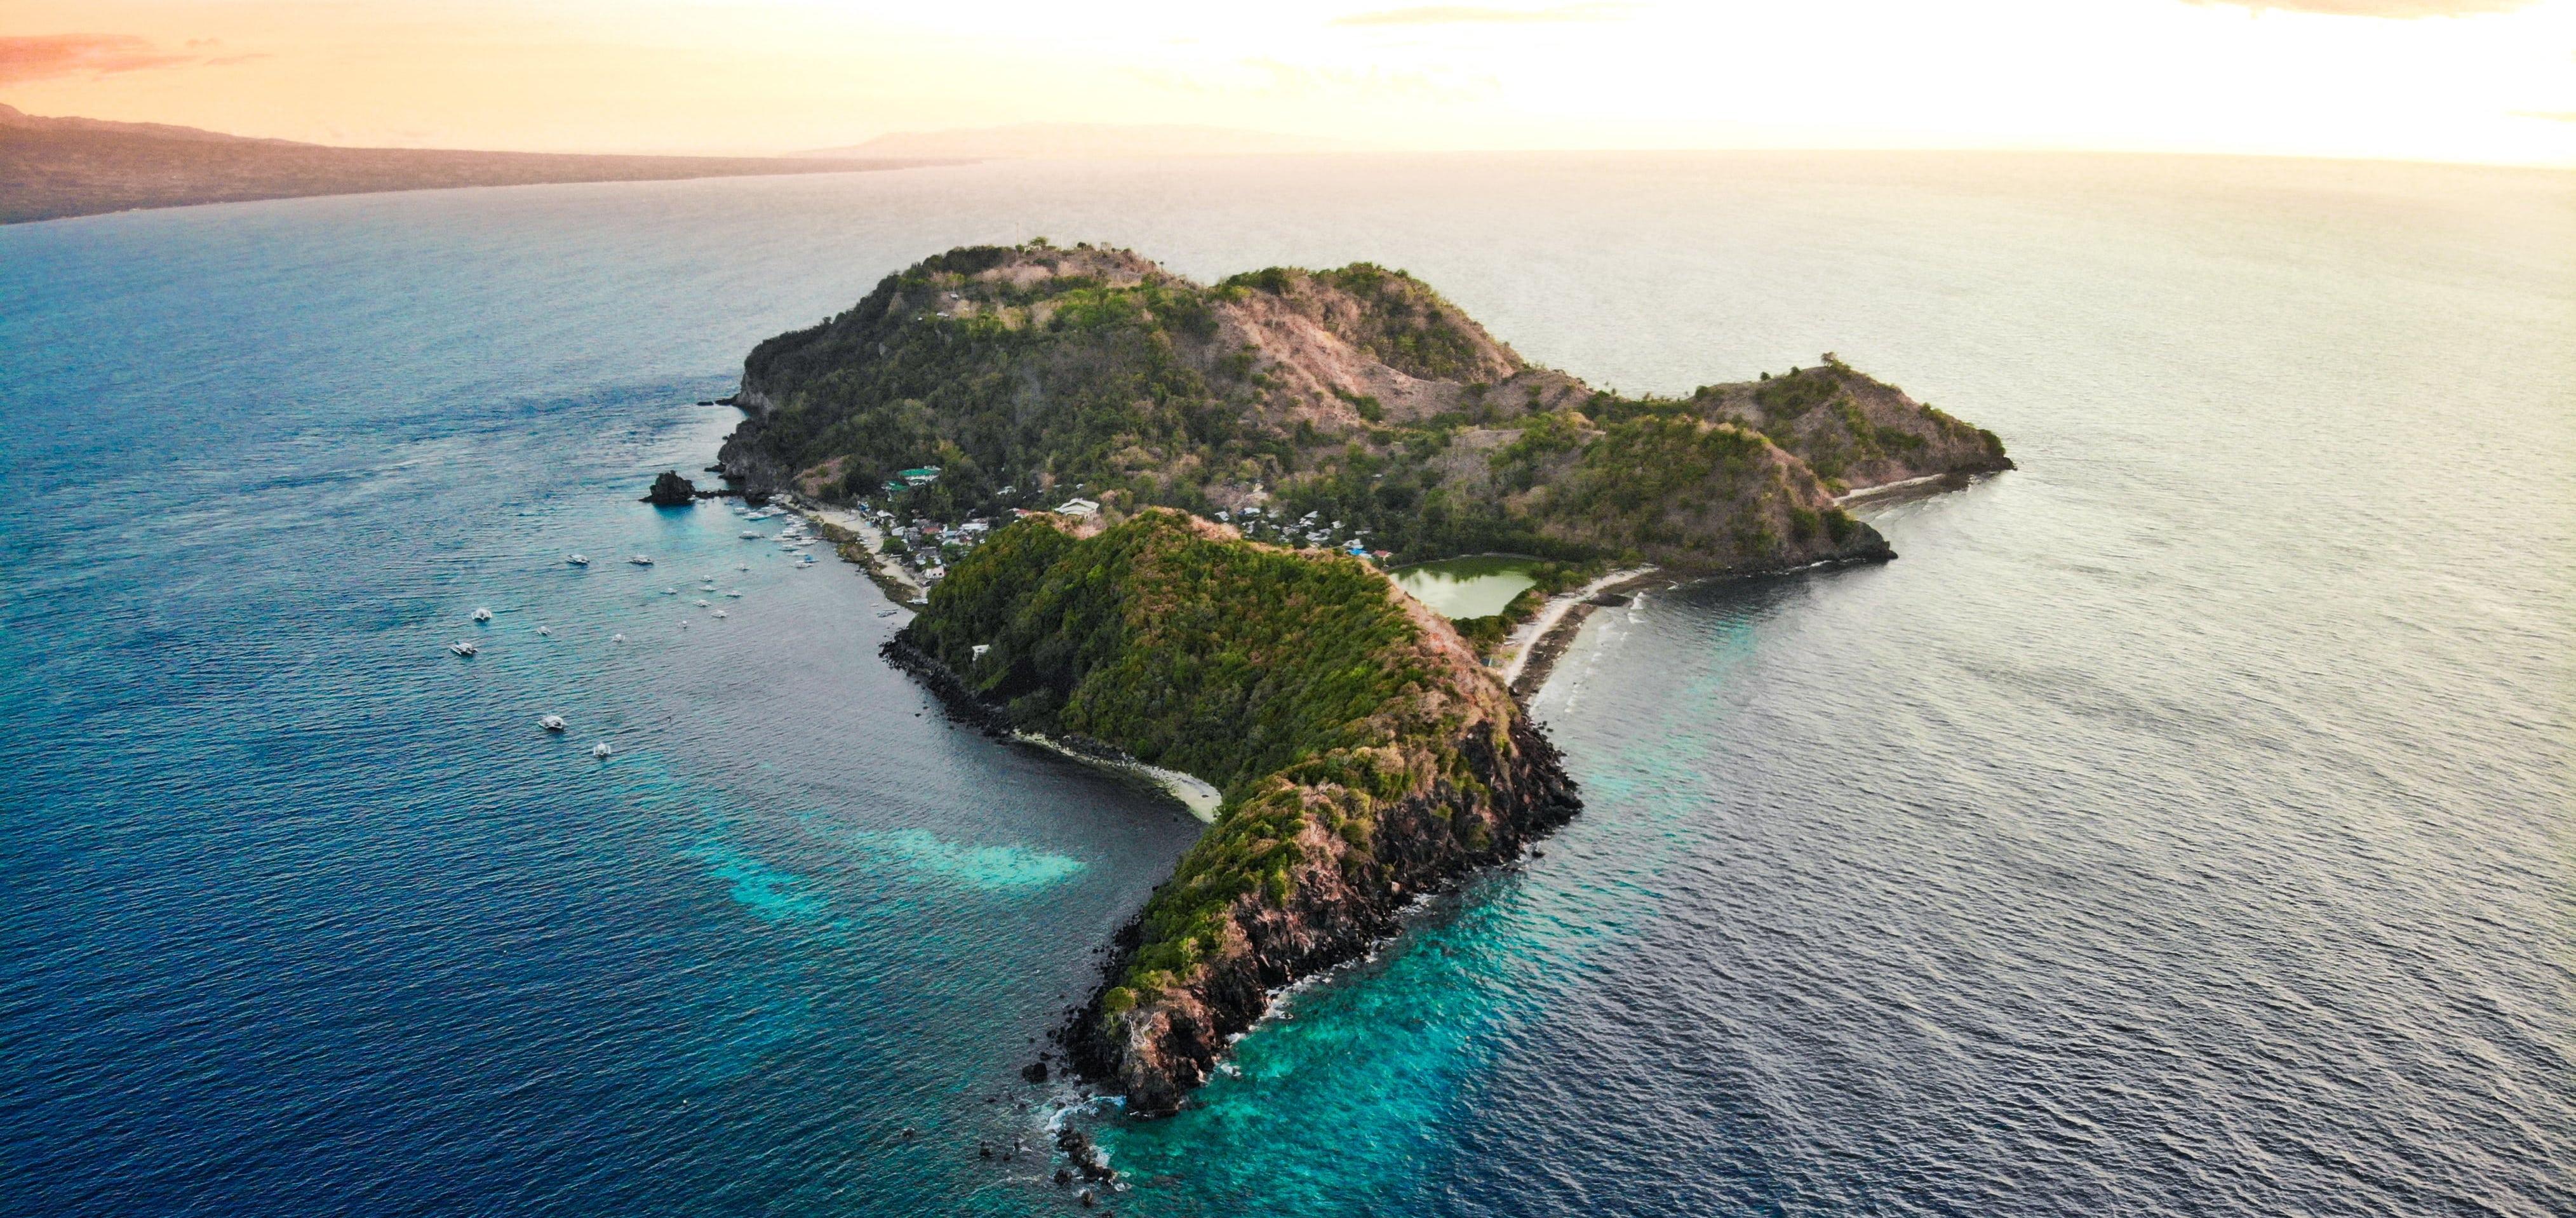 Scenic aerial shot of Apo Island in Dumaguete